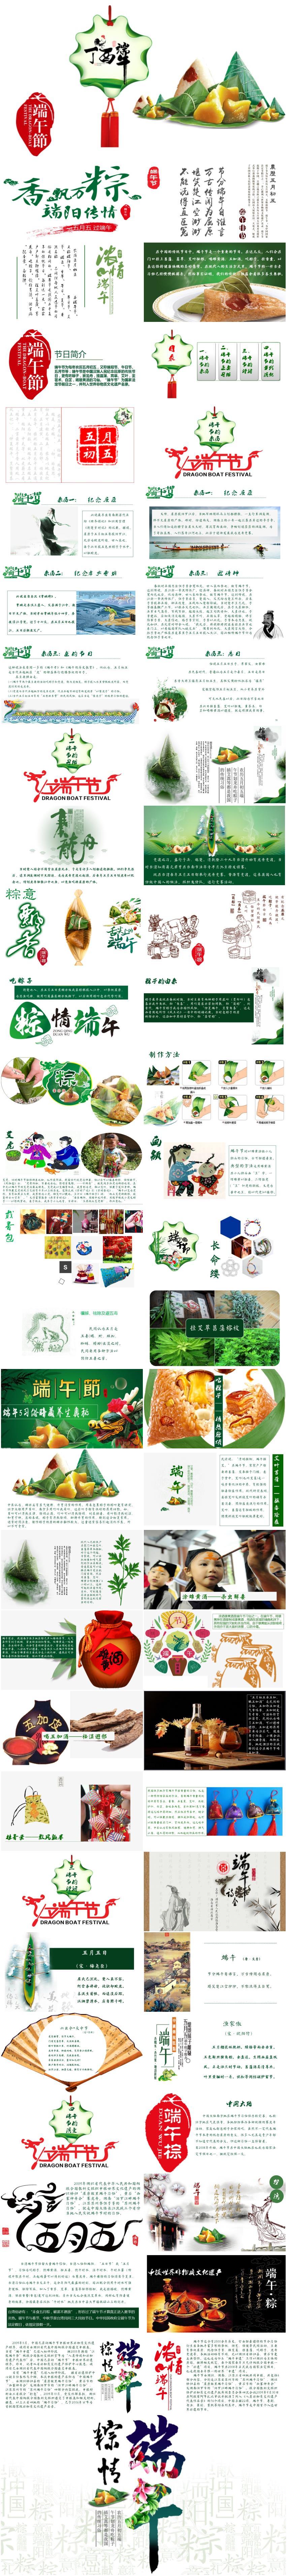 "ppt模板端午节/传统节日文化/非物质文化遗产/端午"""